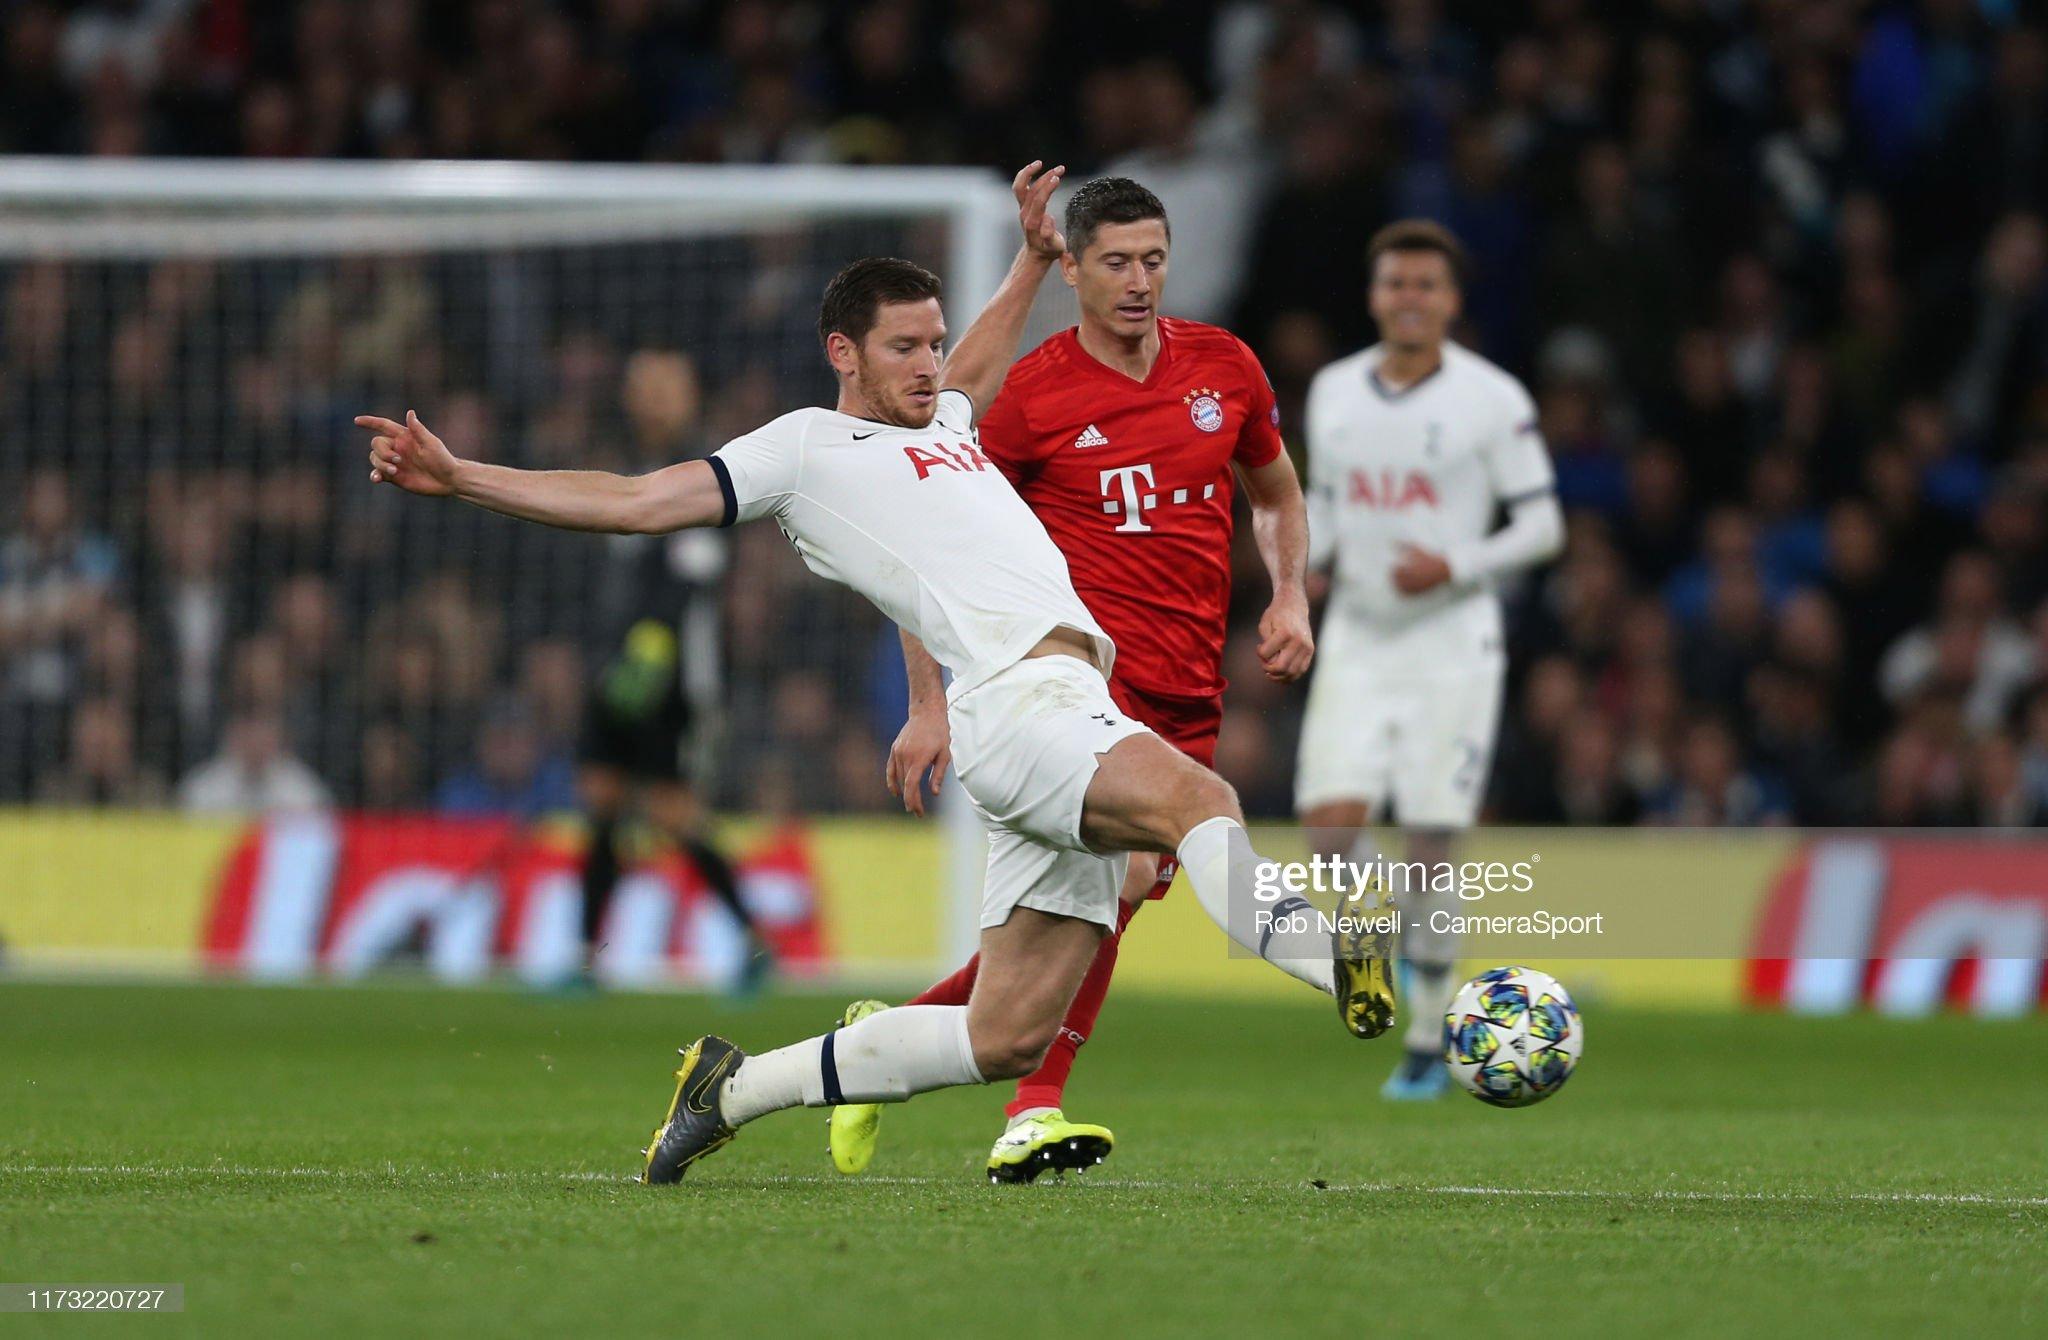 Bayern Munich v Tottenham preview, prediction and odds